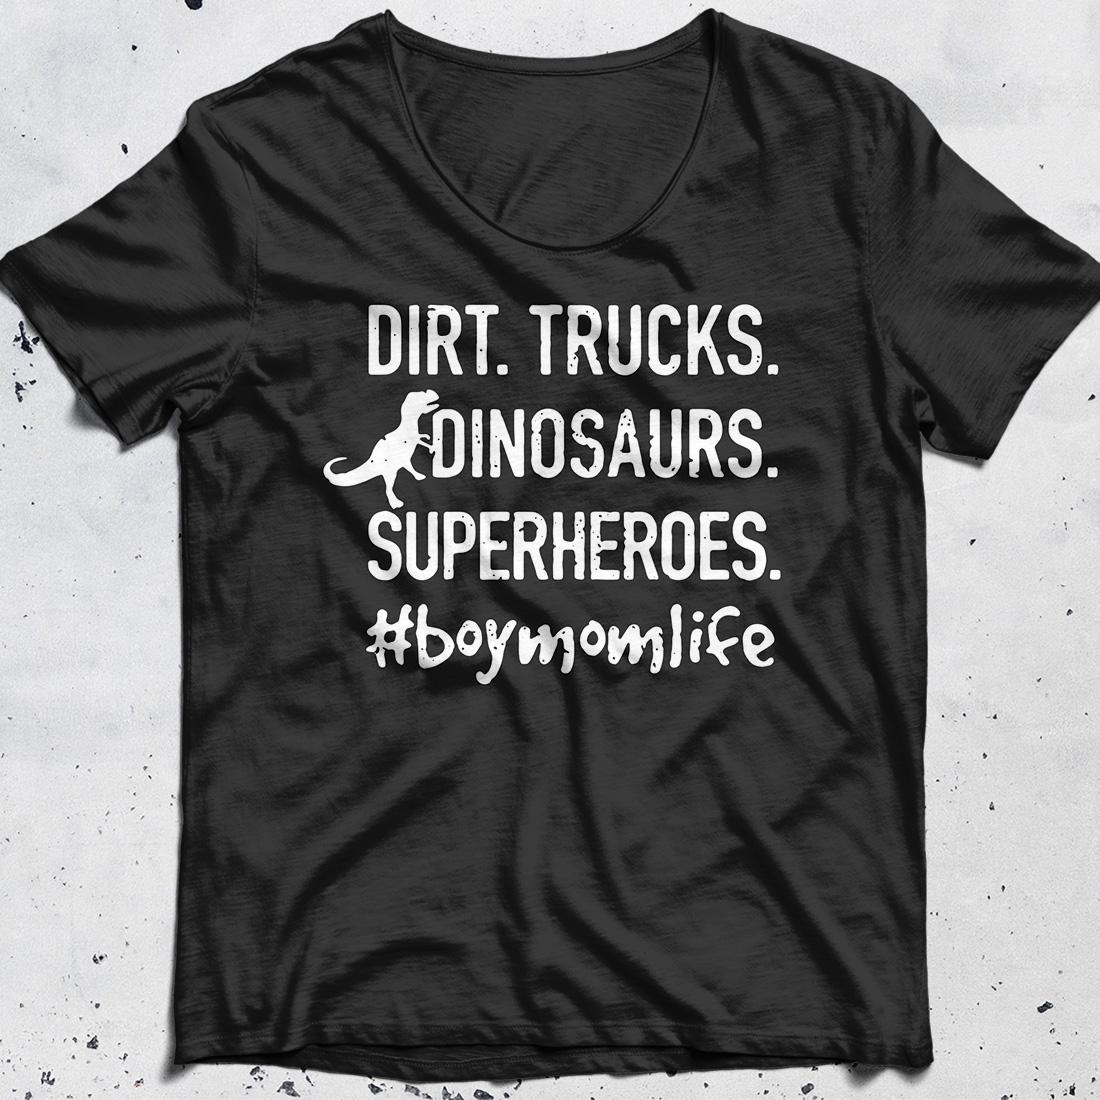 Dirt trucks dinosaurs superheroes boy mom life shirt